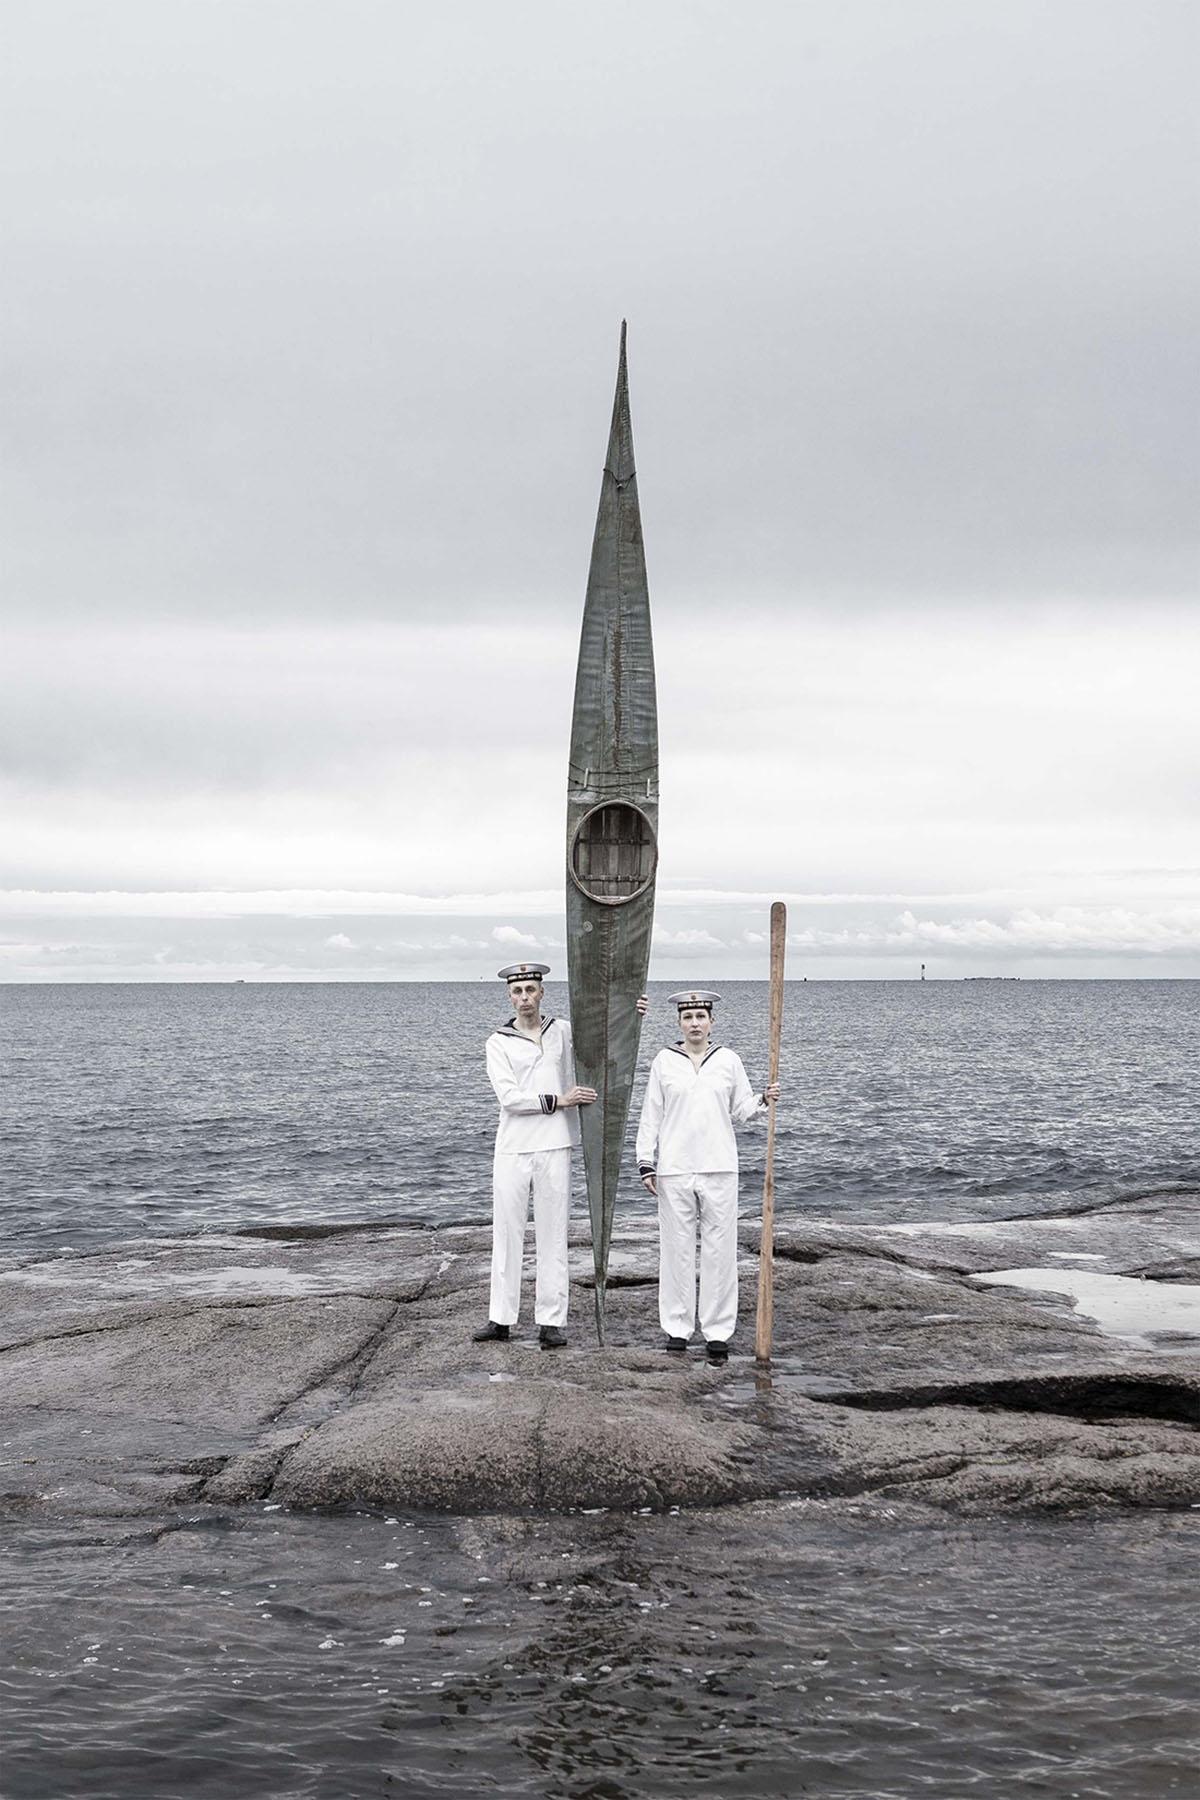 Leka ja Leka seisomassa meren rannalla